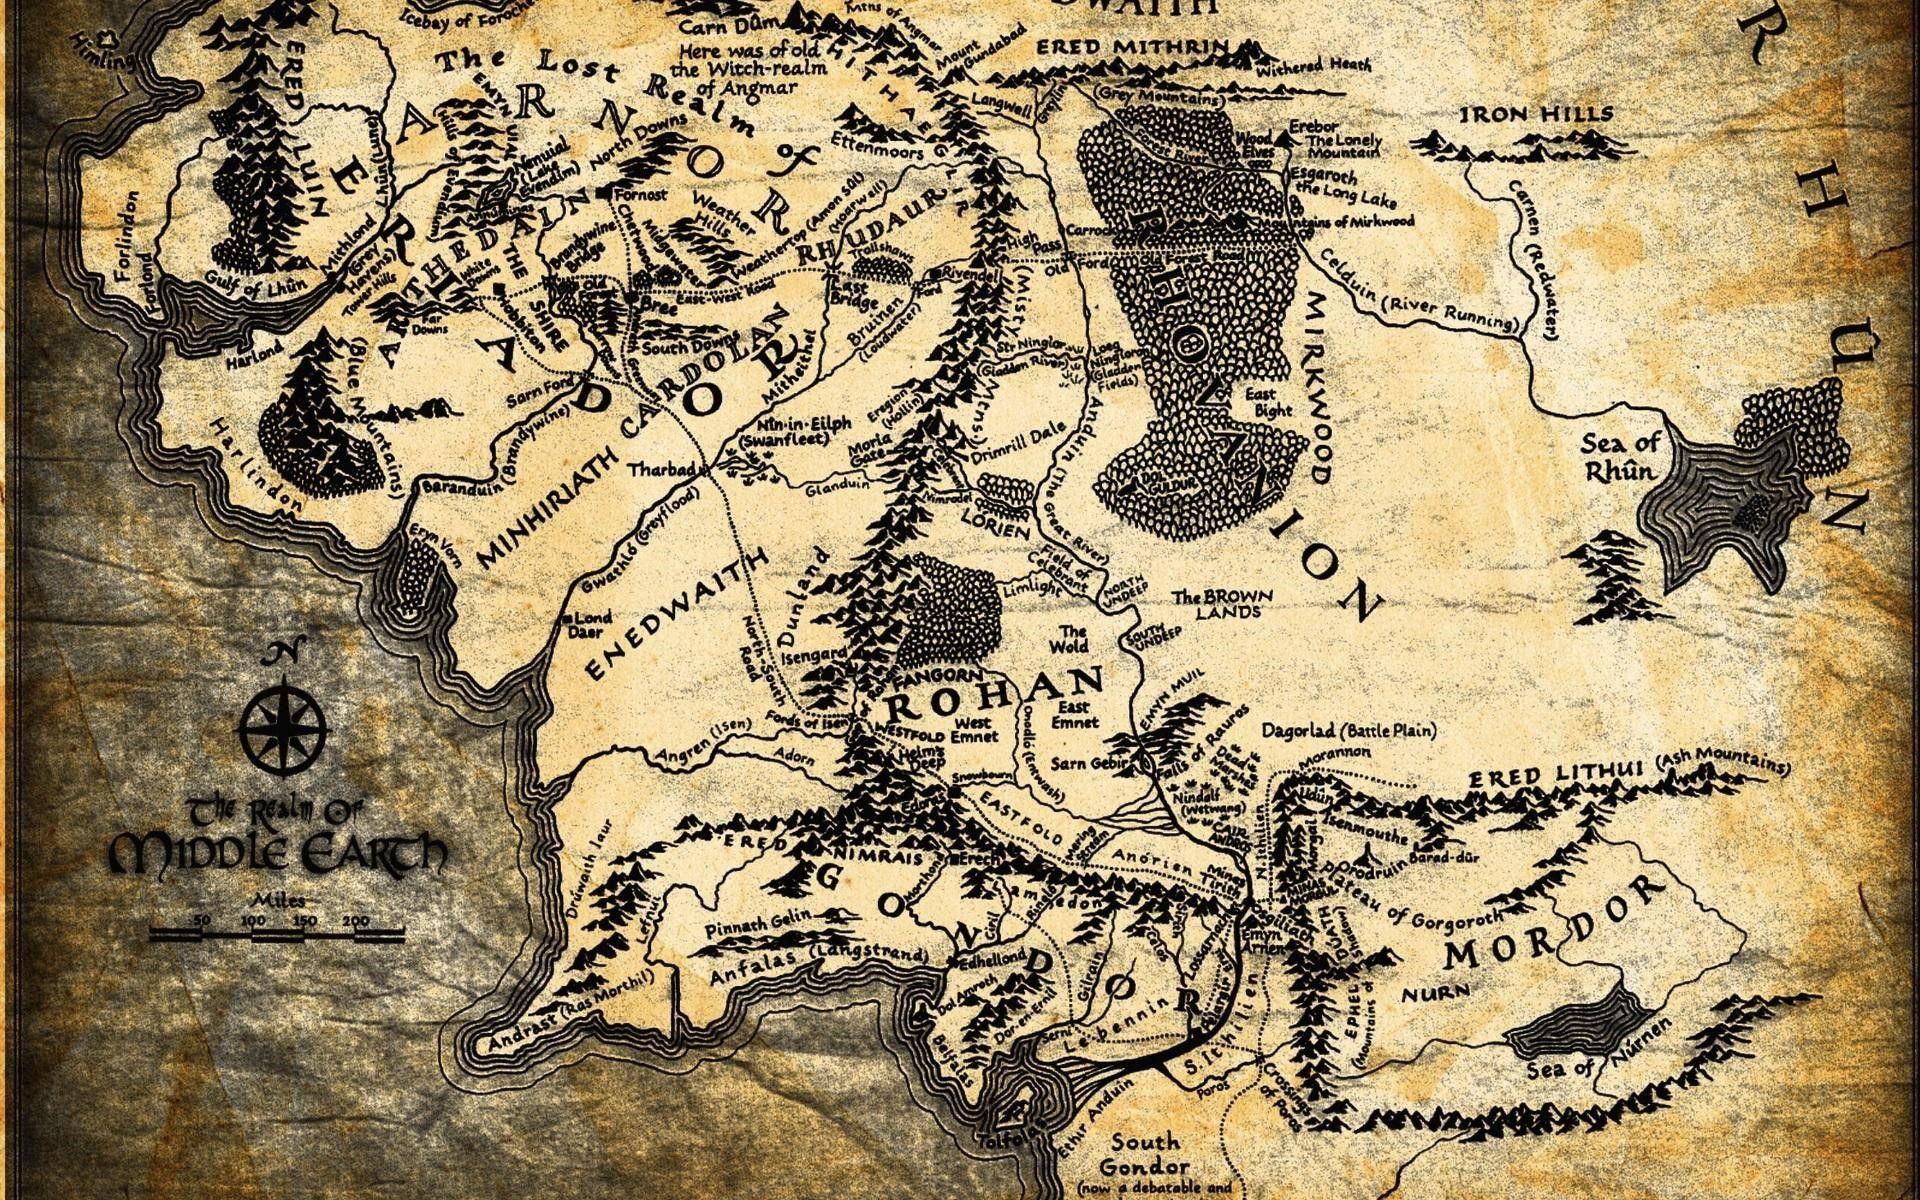 Lord Of The Rings Map Wallpaper Com Imagens Senhor Dos Aneis